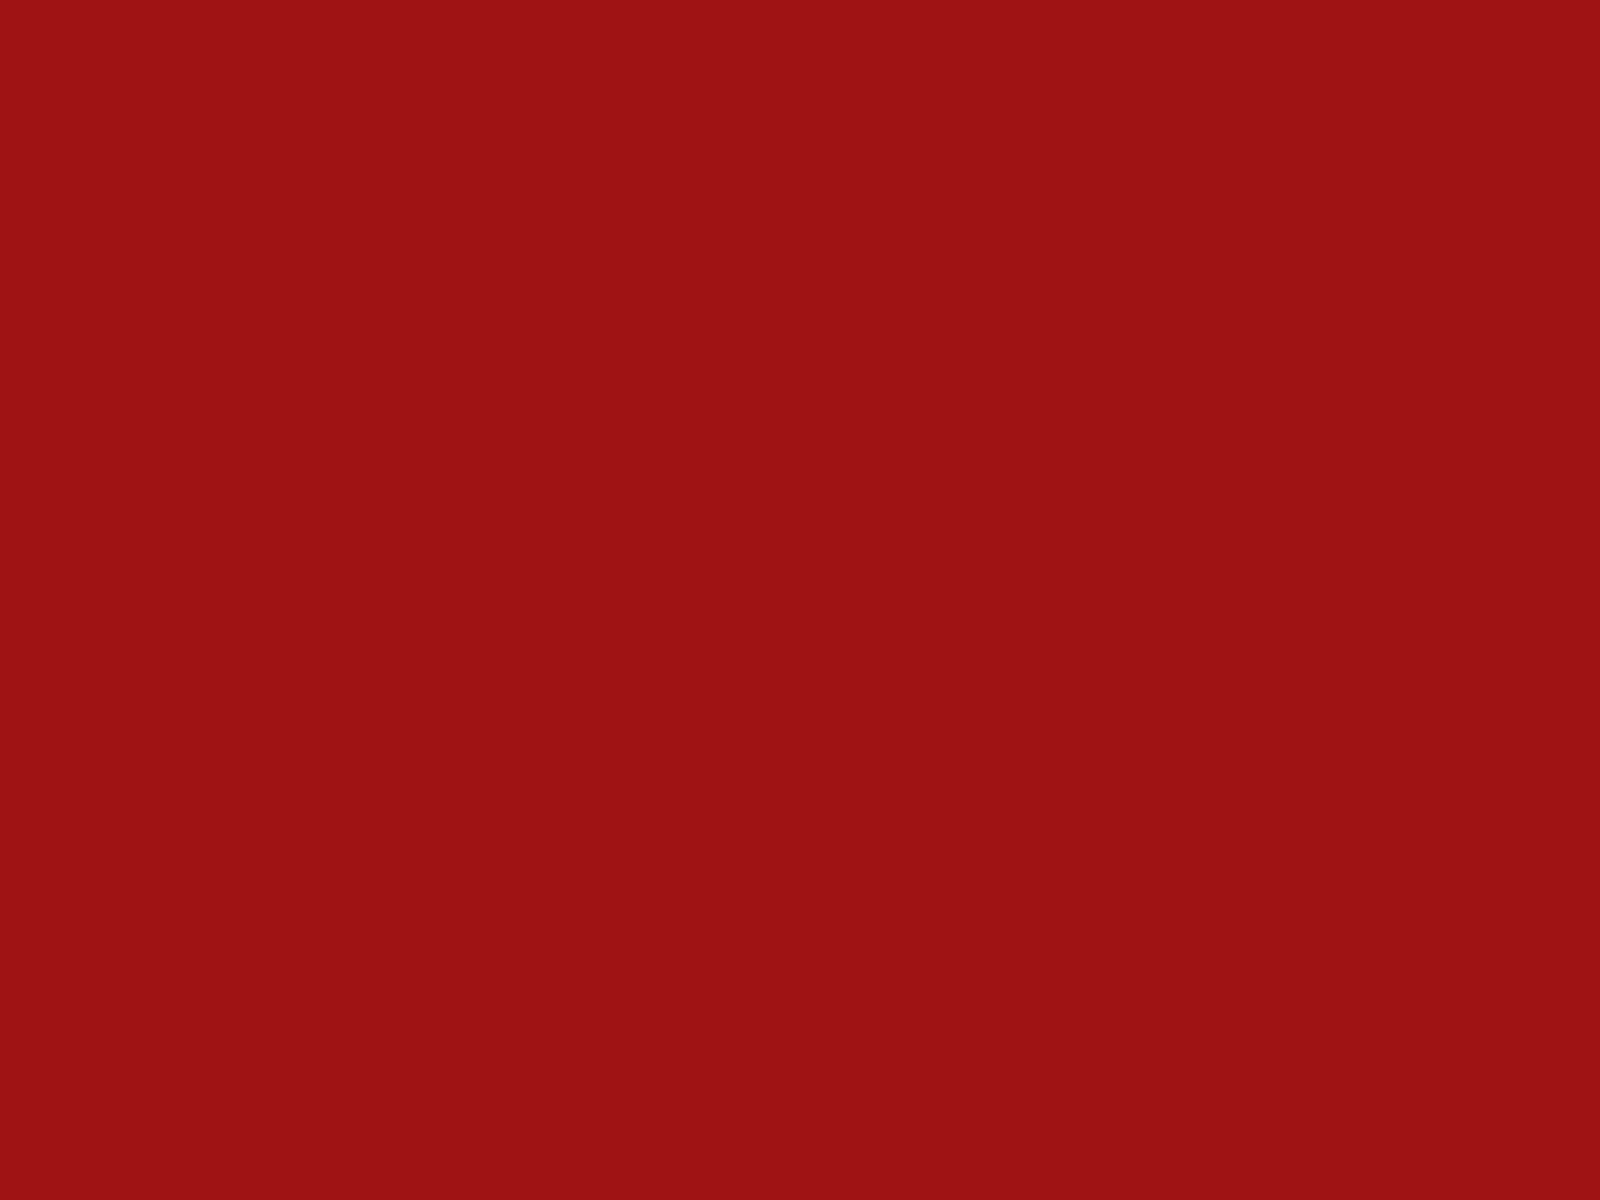 1600x1200 Spartan Crimson Solid Color Background